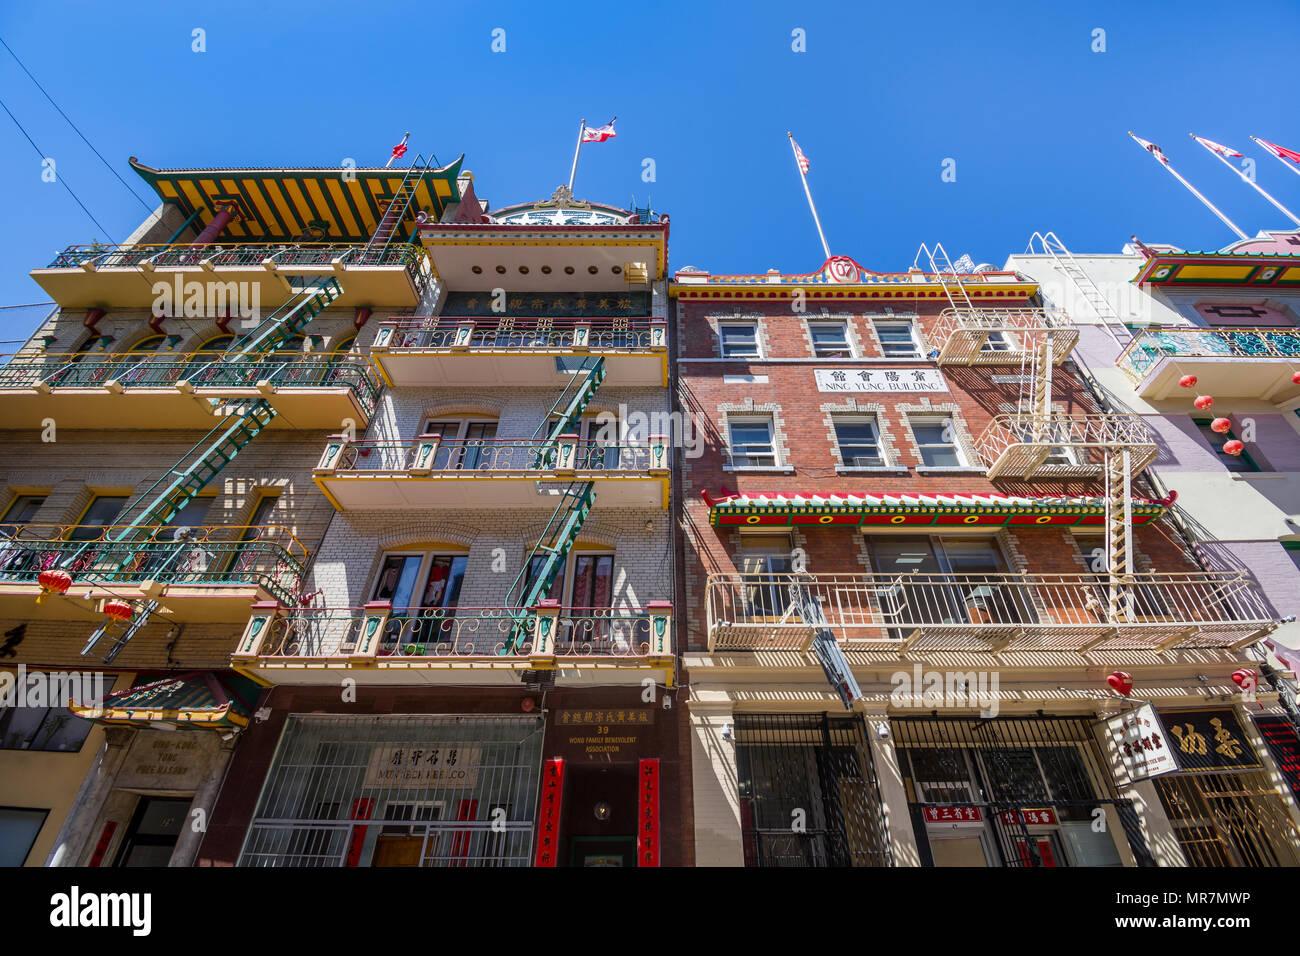 Chinatown, San Francisco, CA, USA. - Stock Image